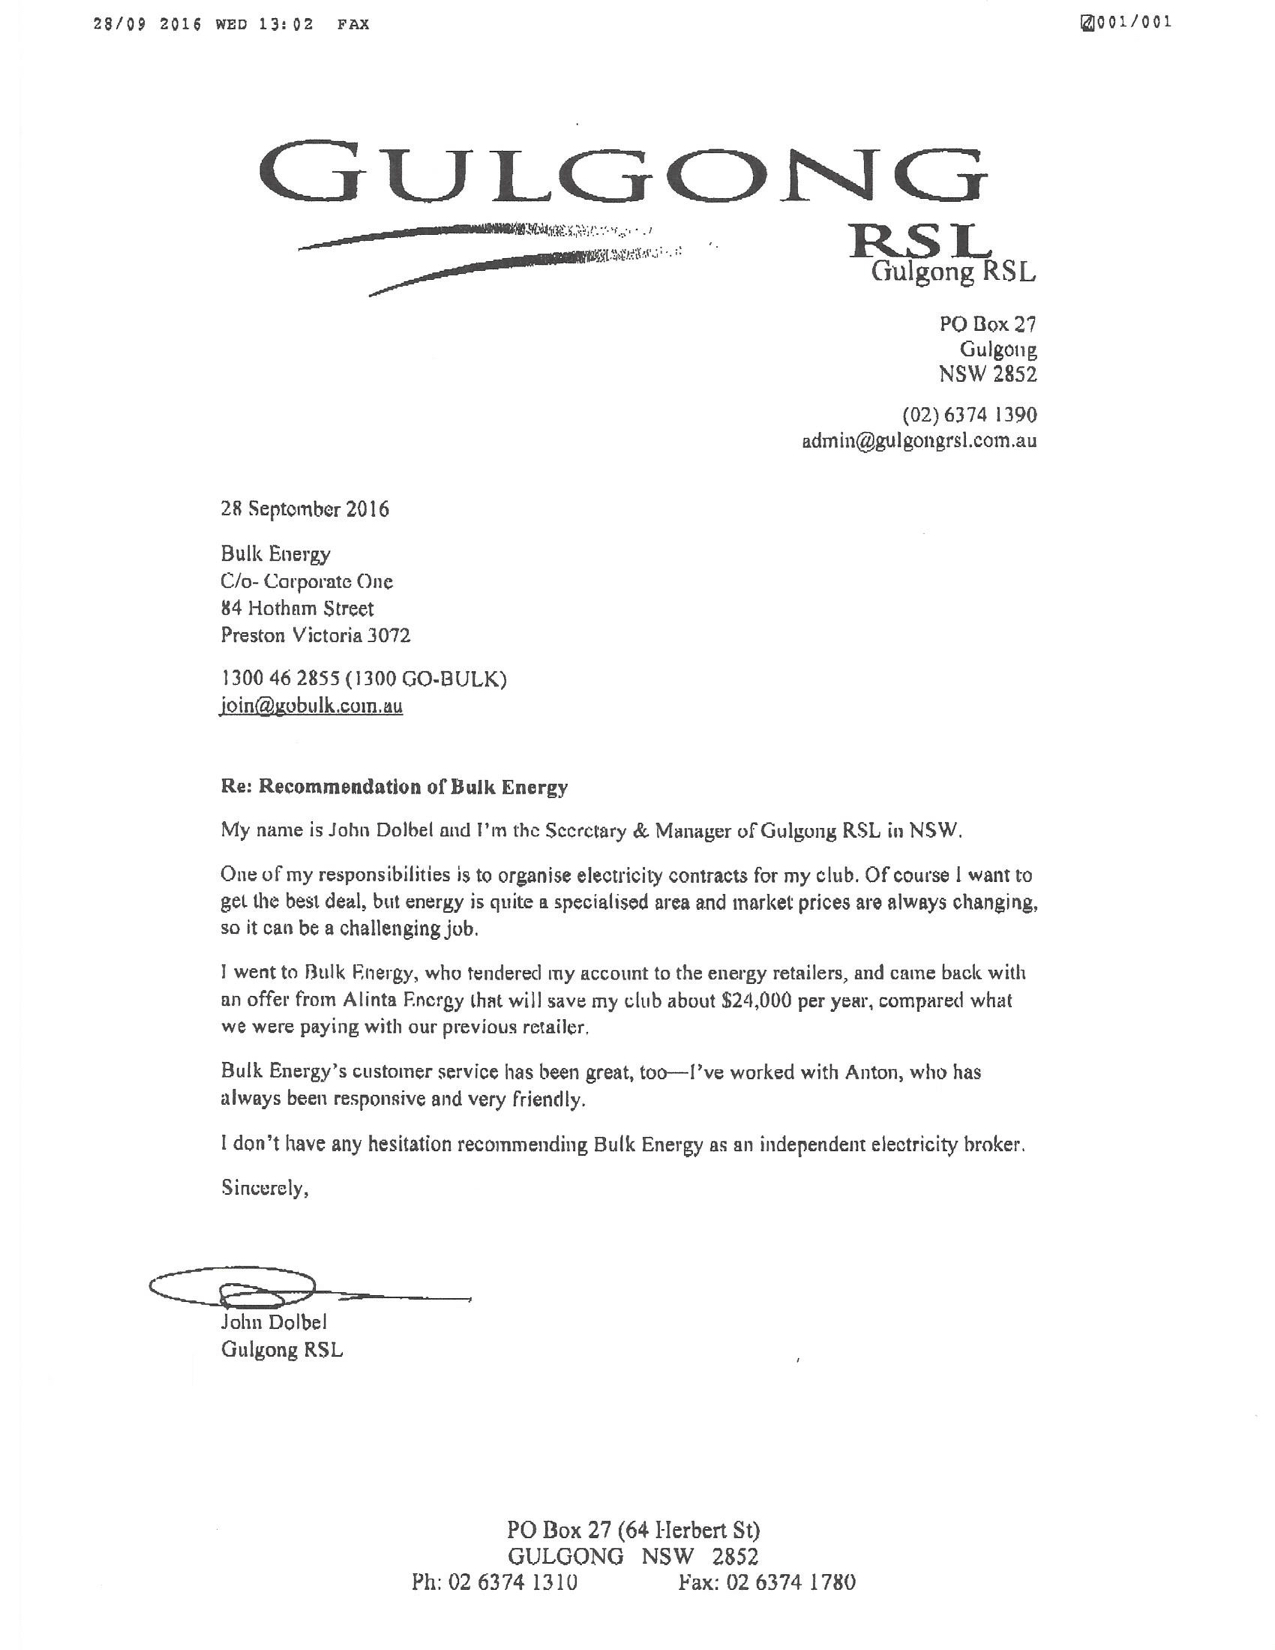 Anton Battista - Gulgong RSL Testimonial | Bulk Energy